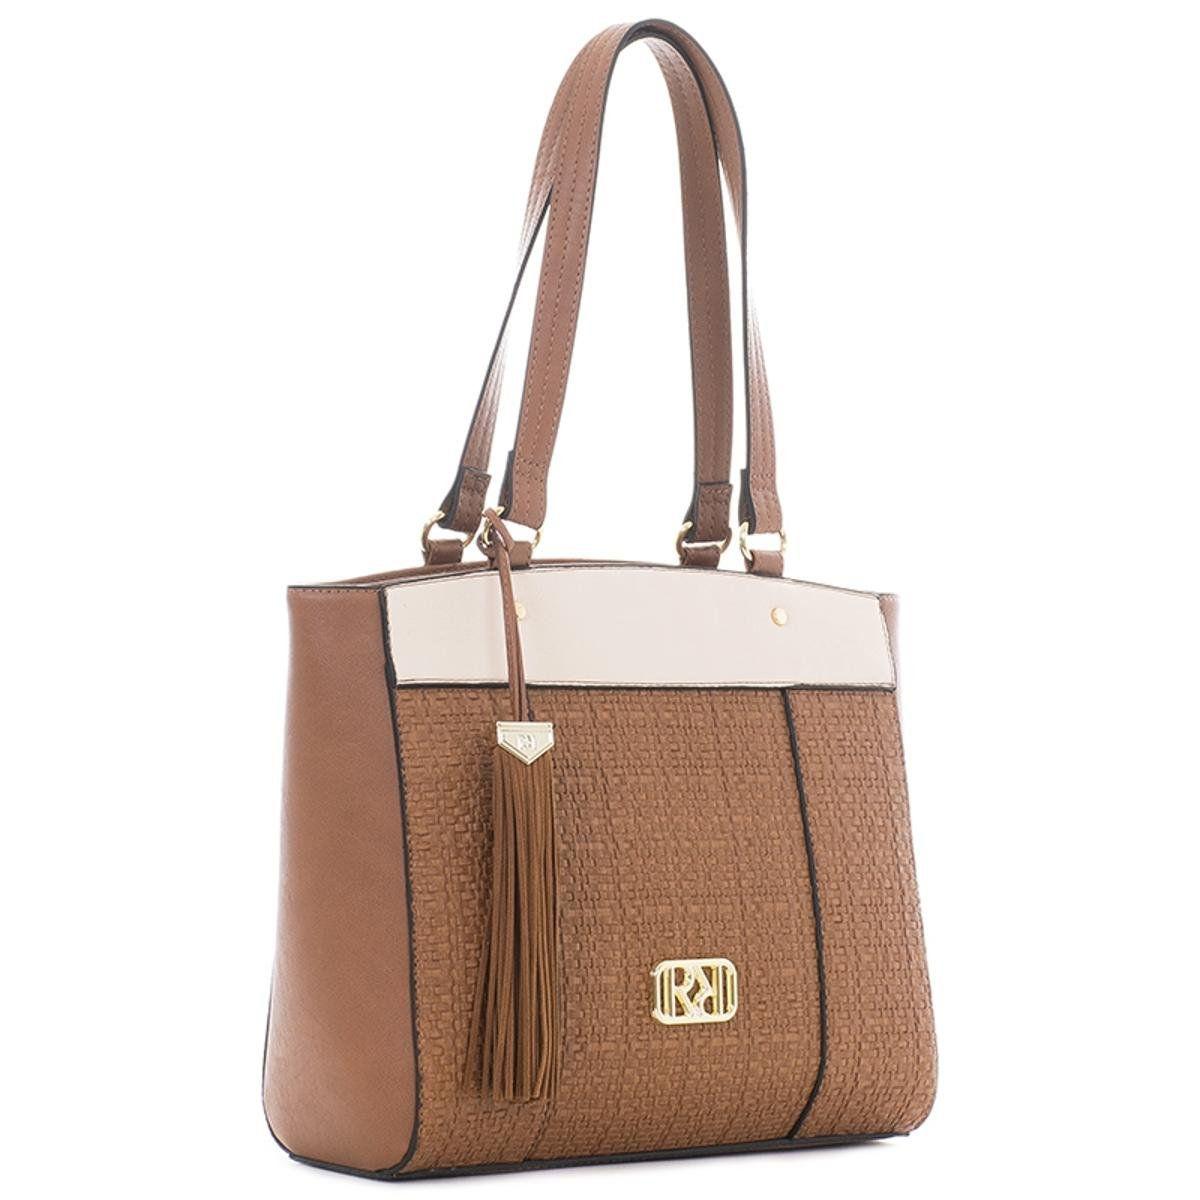 Bolsa rafitthy Tote Bag Marrom Feminino